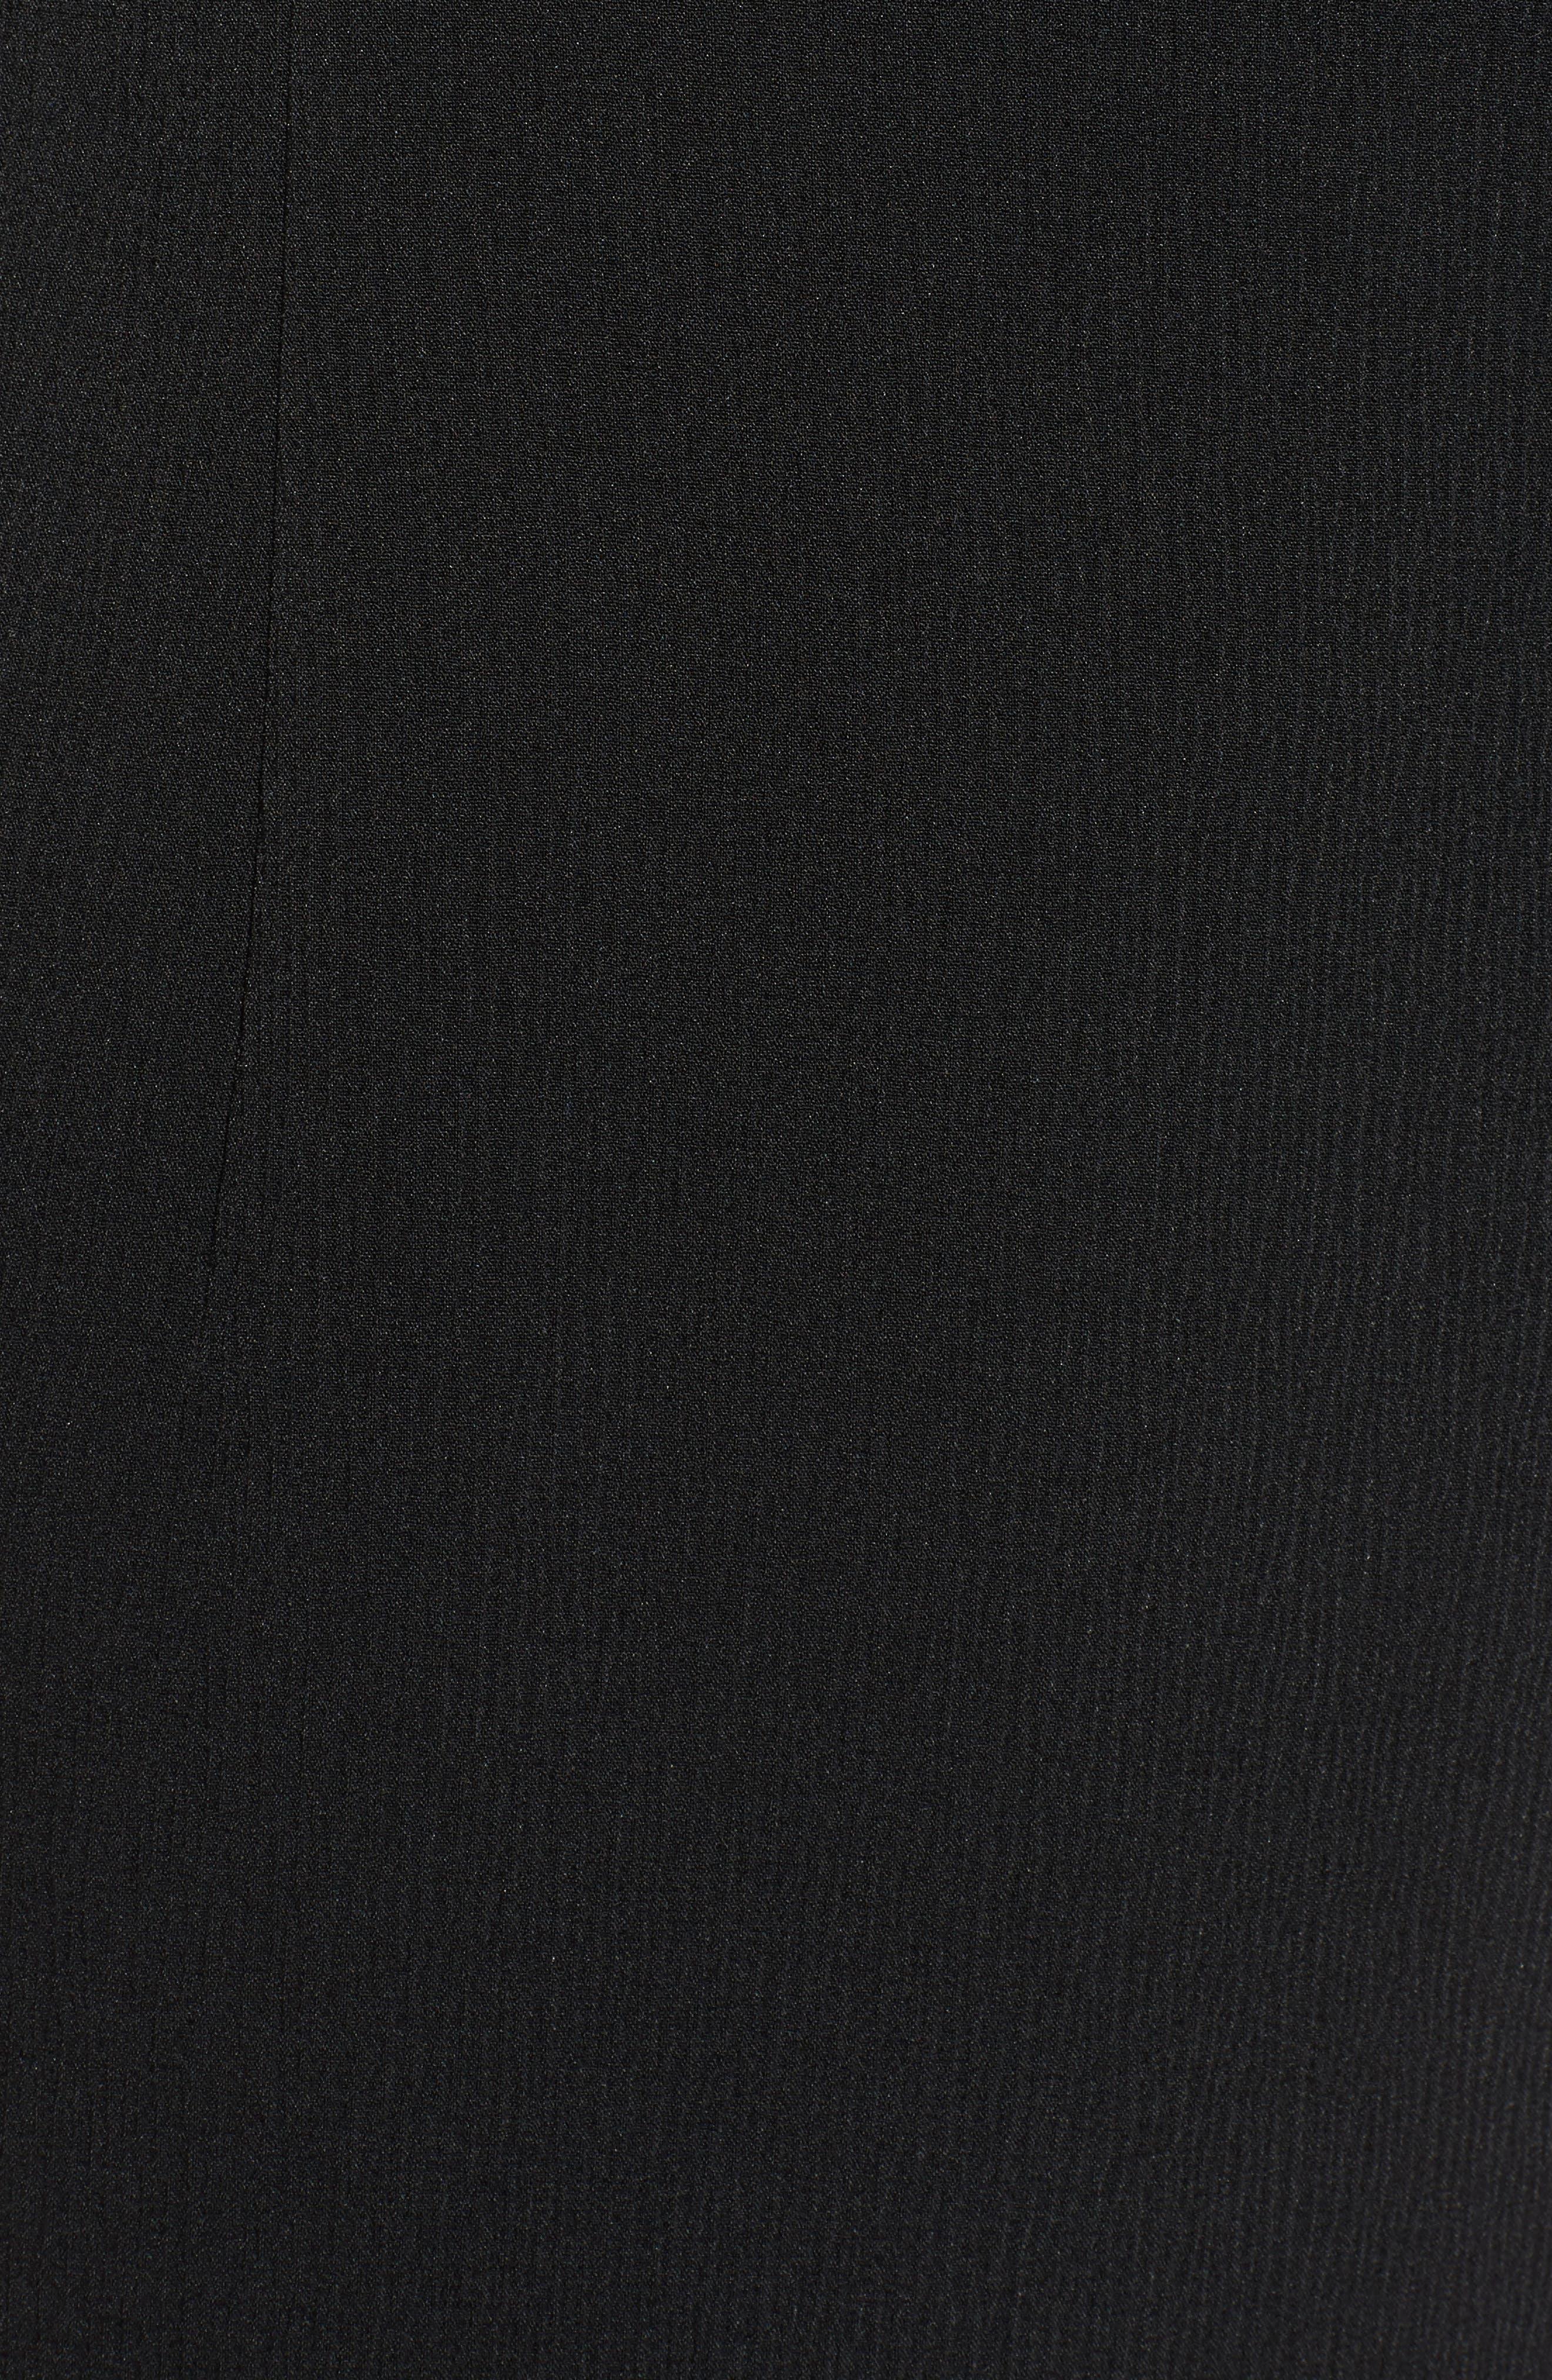 Dadena Crepe Sheath Dress,                             Alternate thumbnail 5, color,                             001